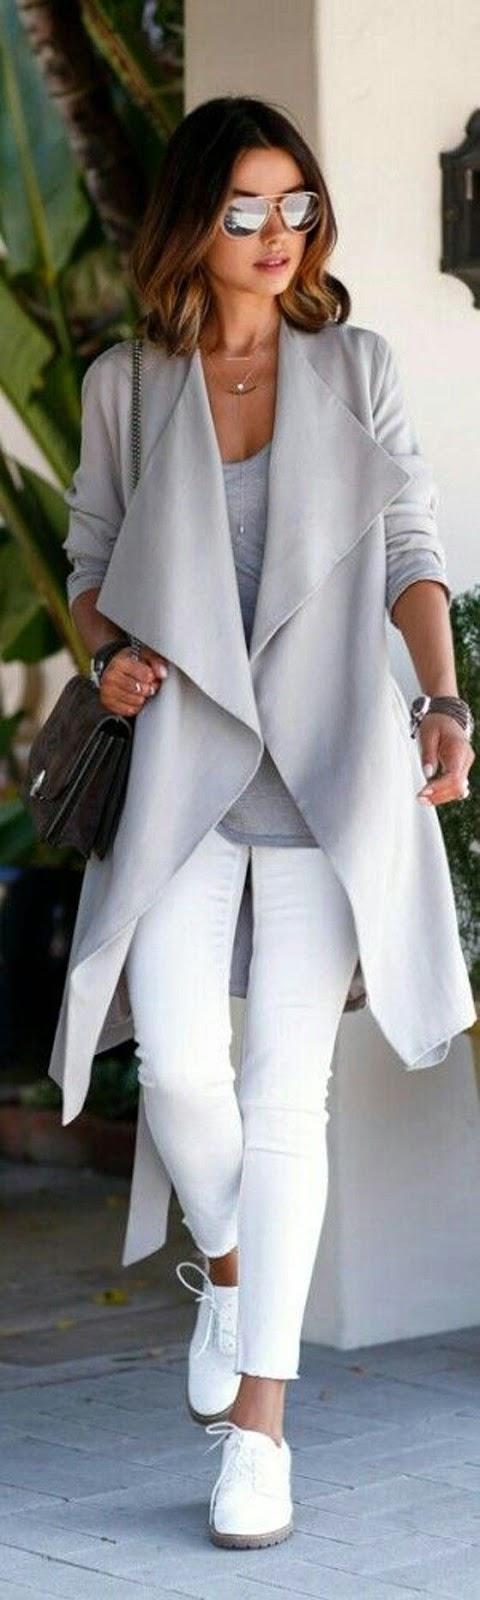 50 Long Sleeve Trench Coat